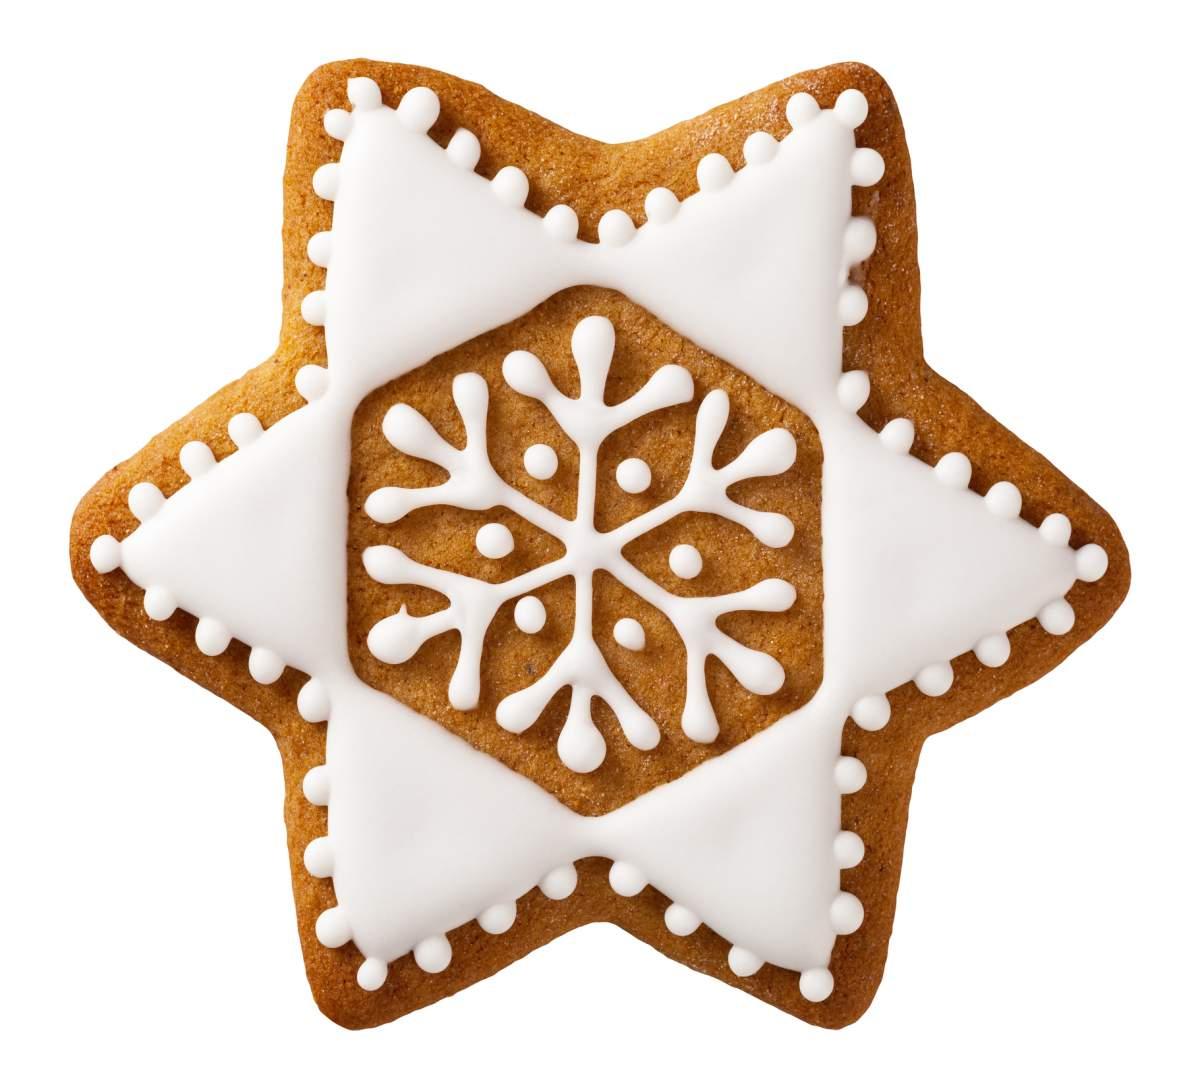 image Biscuit étoile au chocolat (star bread)